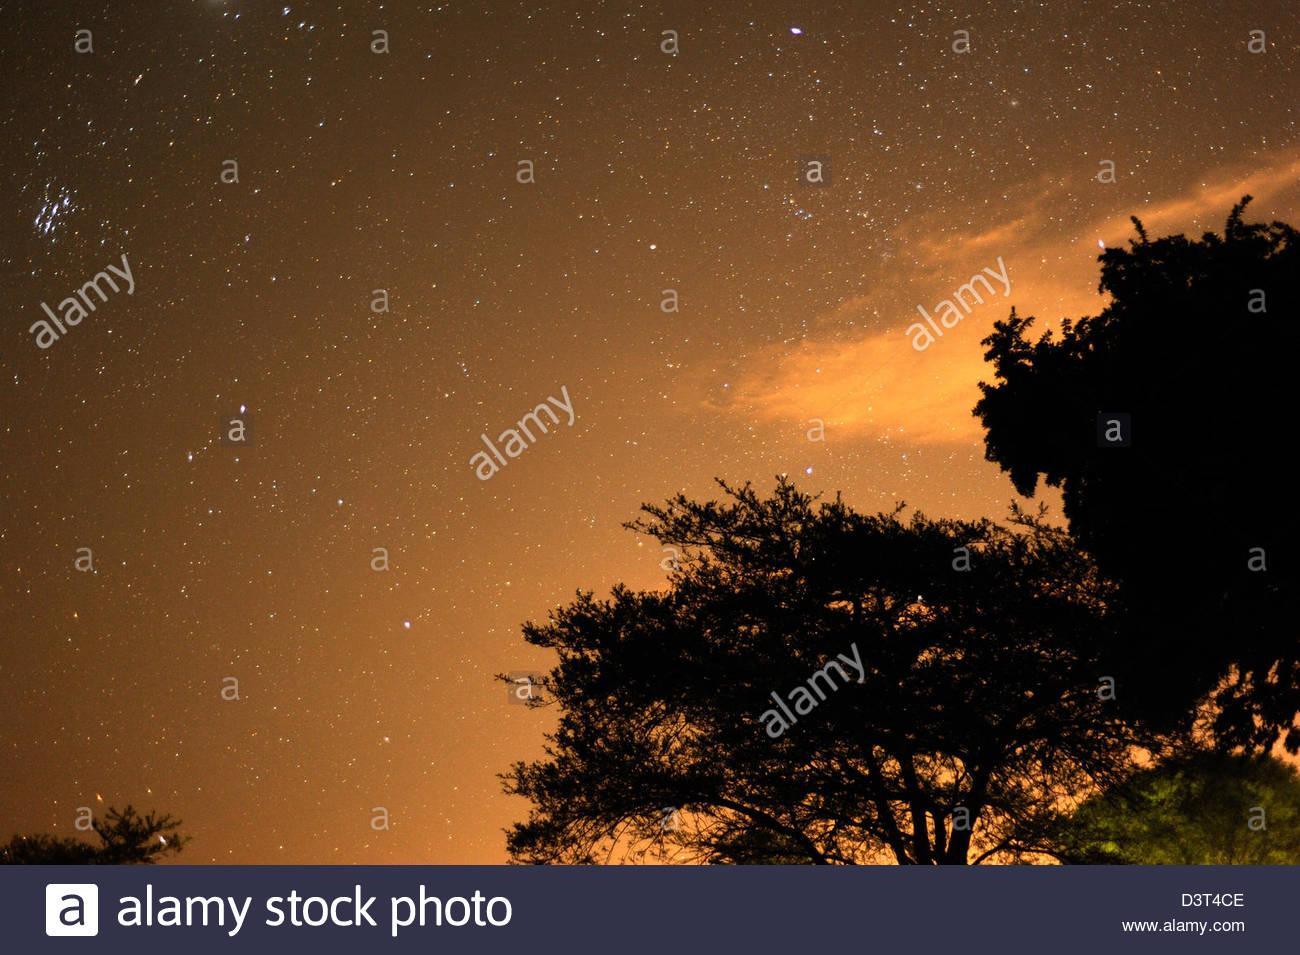 mlilwane-swaziland-night-sky-with-acacia